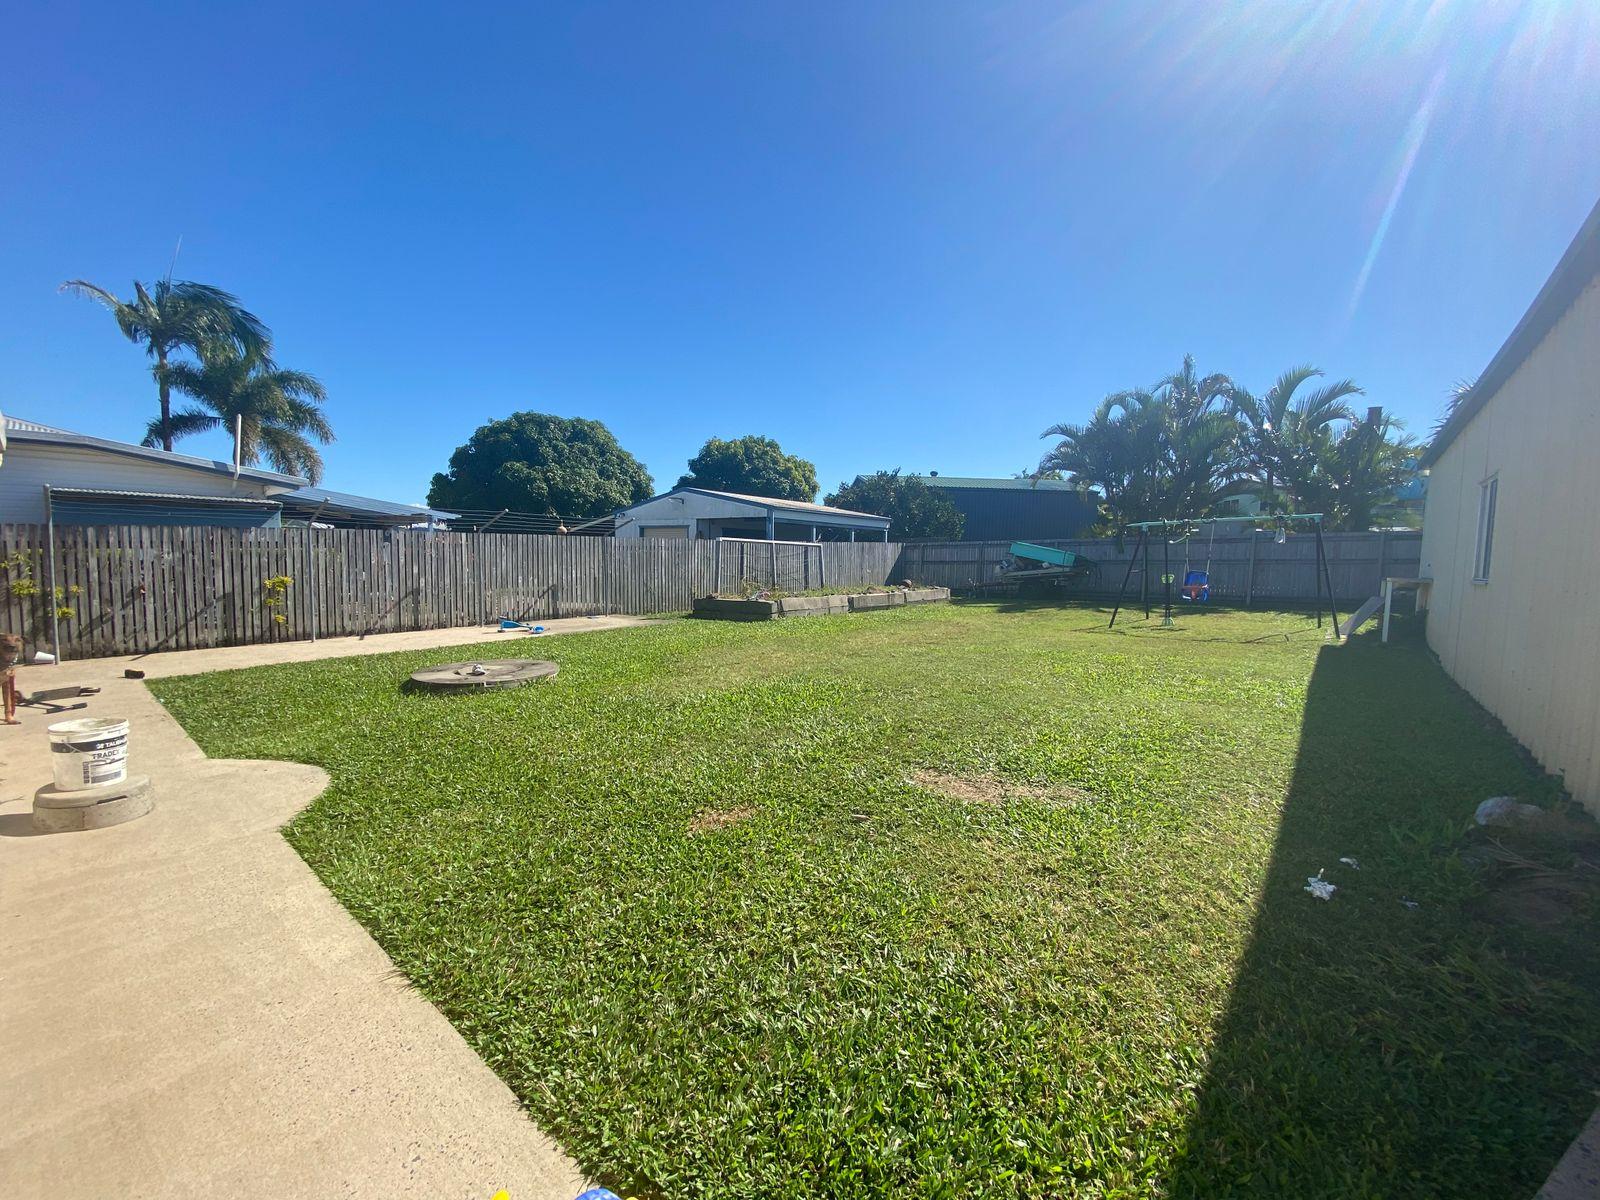 50 Campwin Beach Road, Campwin Beach, QLD 4737